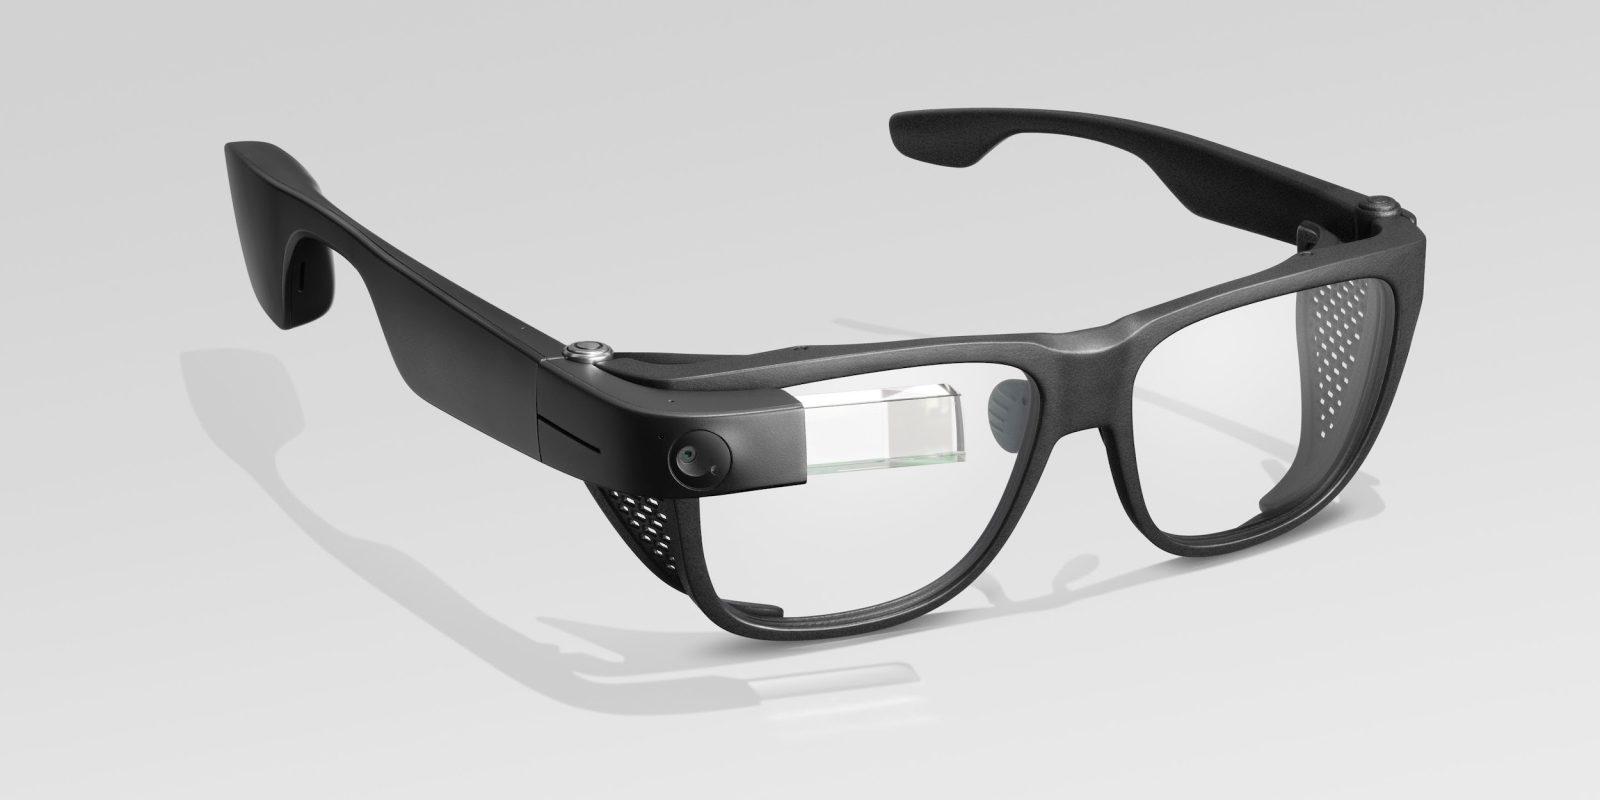 20305f524 معلومات جديدة عن نظارات جوجل الذكية Glass Enterprise Edition 2 ...